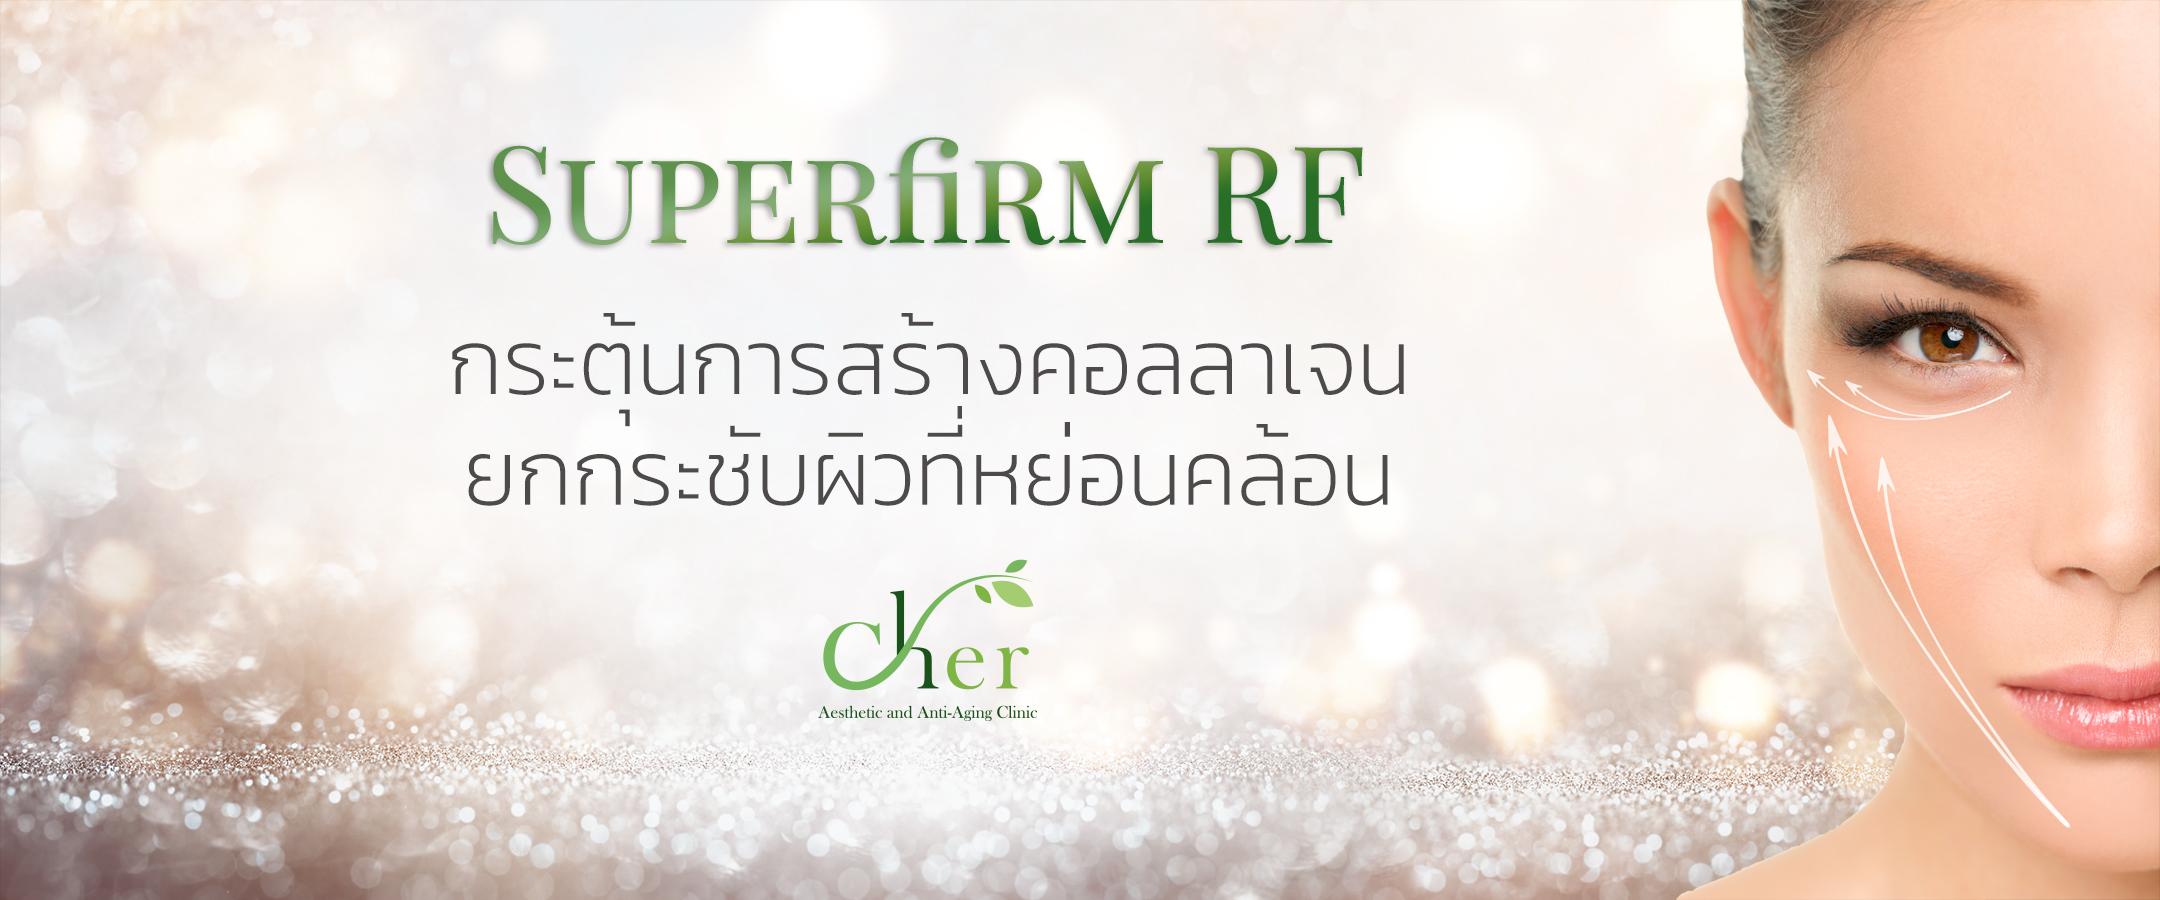 superfirm RF L copy.jpg